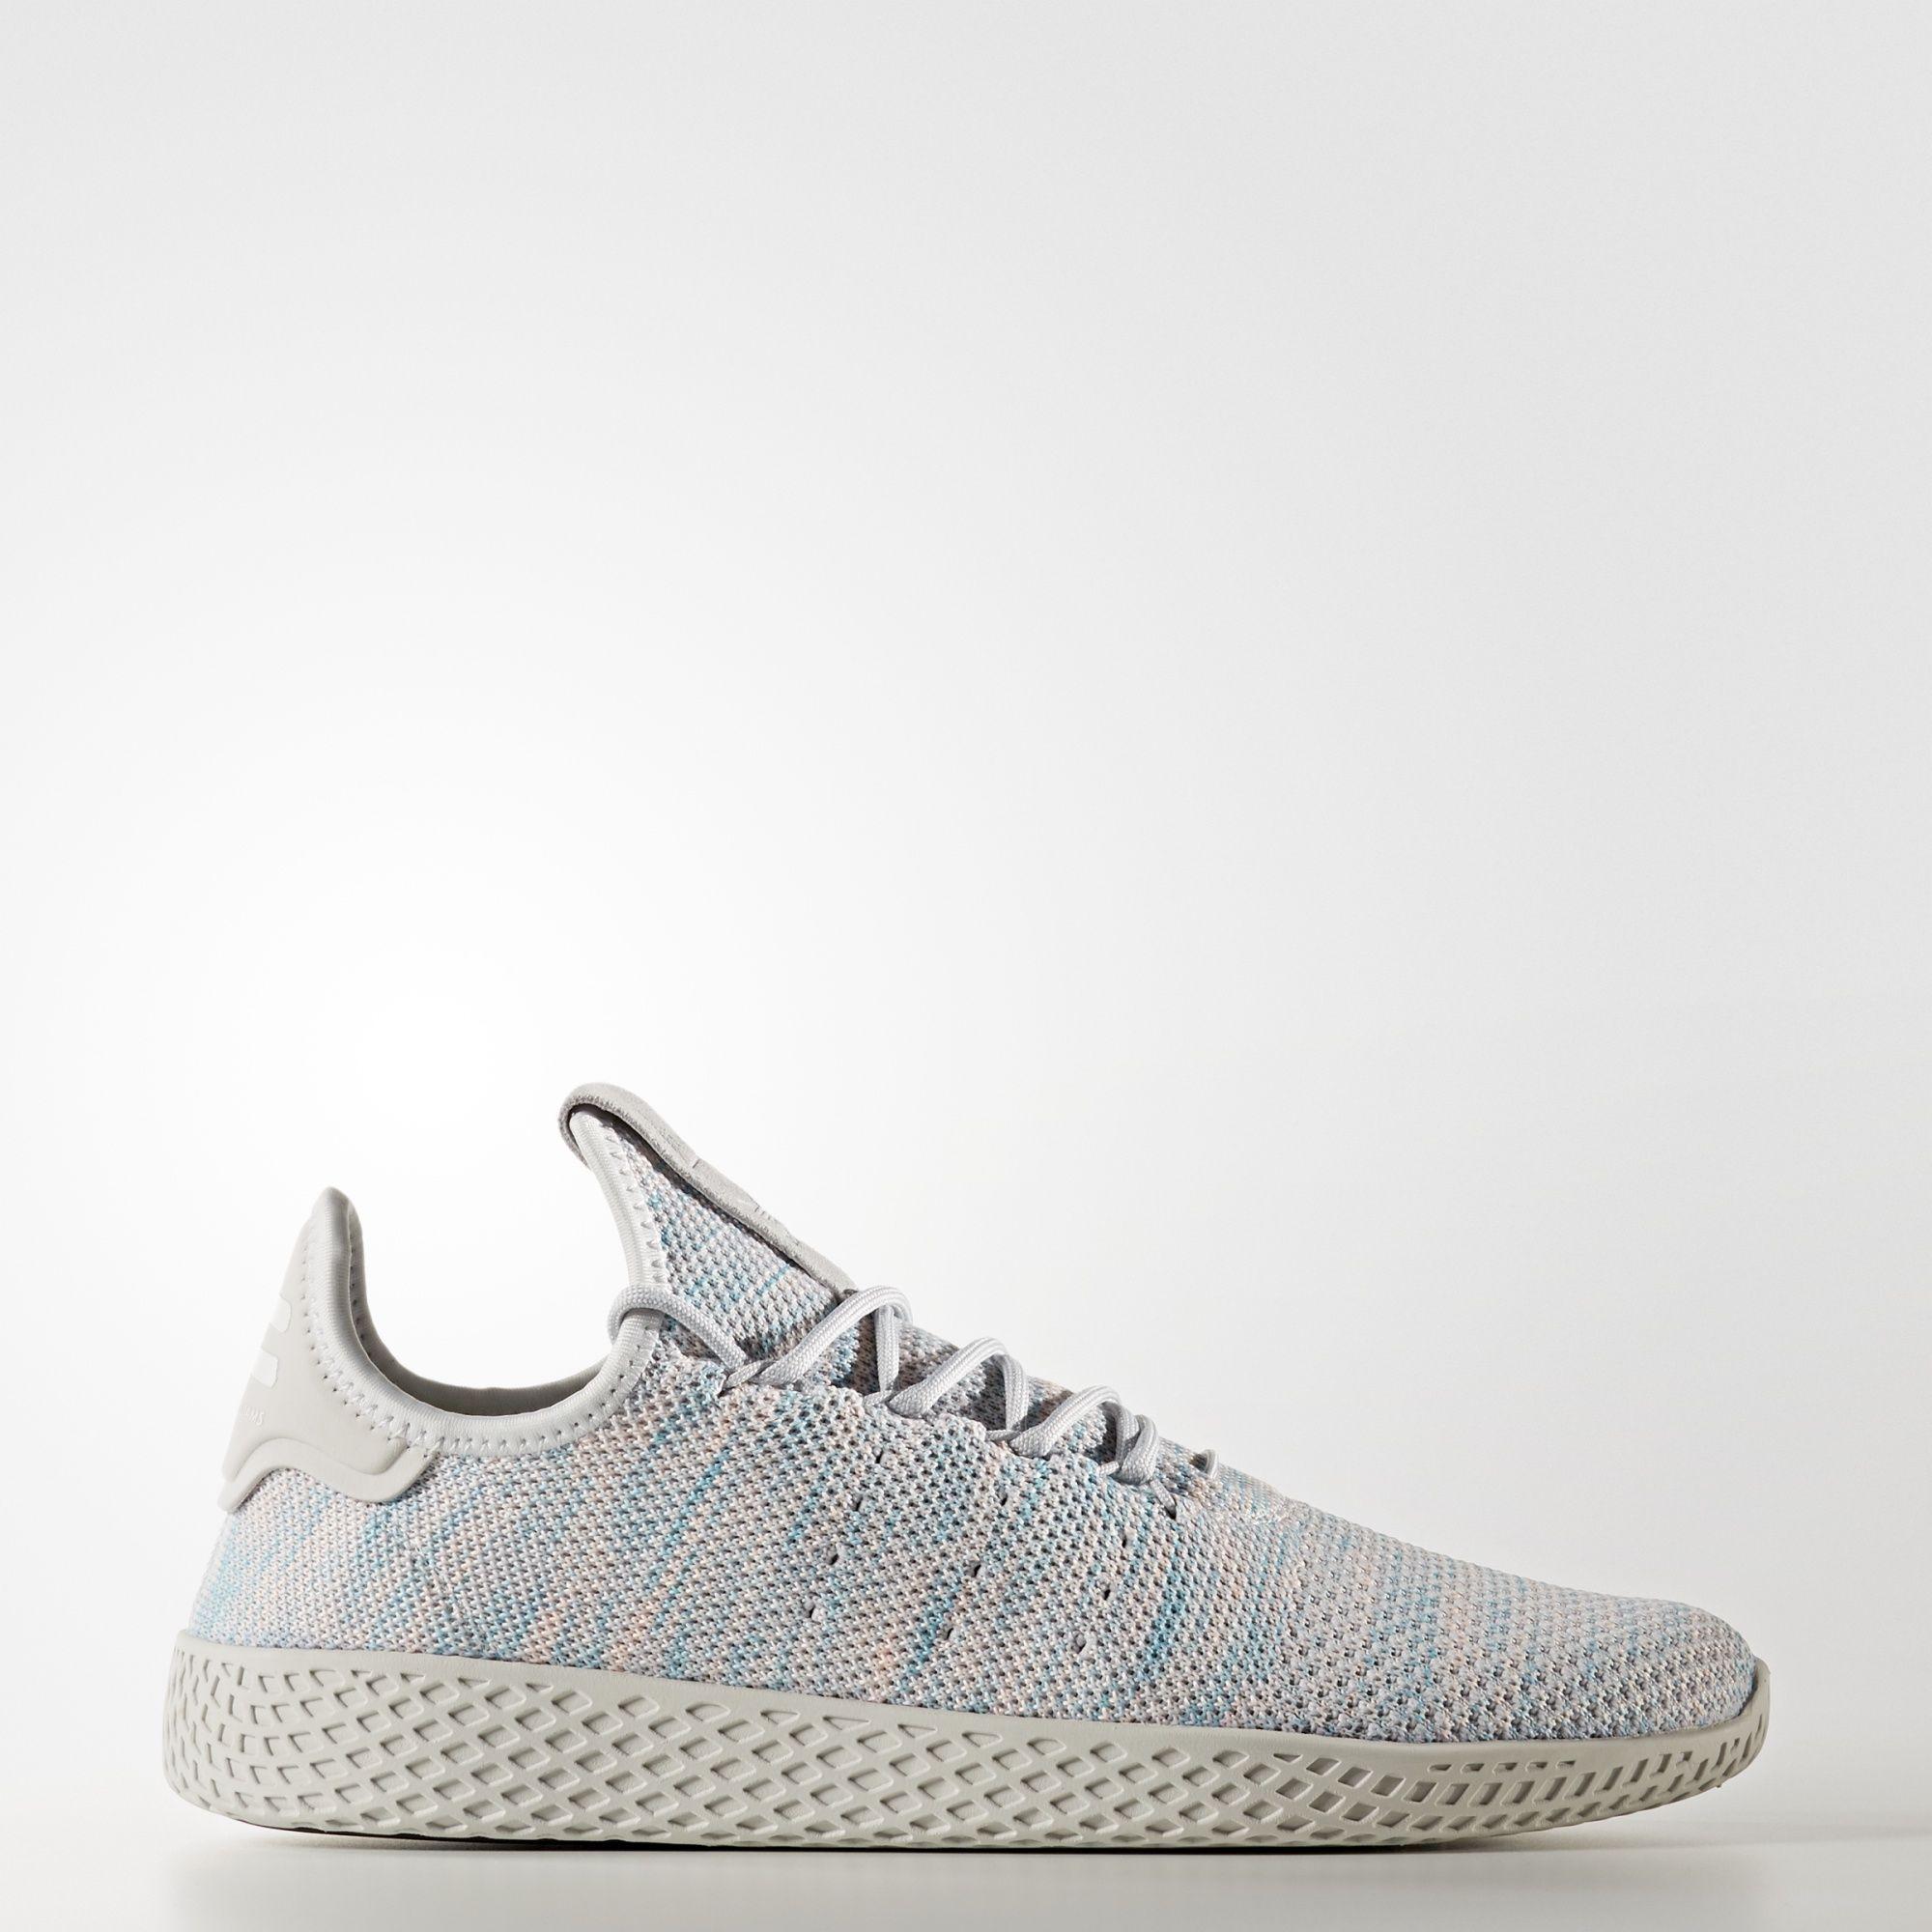 Zapatillas 19955 Williams Hombre adidas Pharrell Williams Tennis Shoes Hu Shoes | d5bec06 - rogvitaminer.website